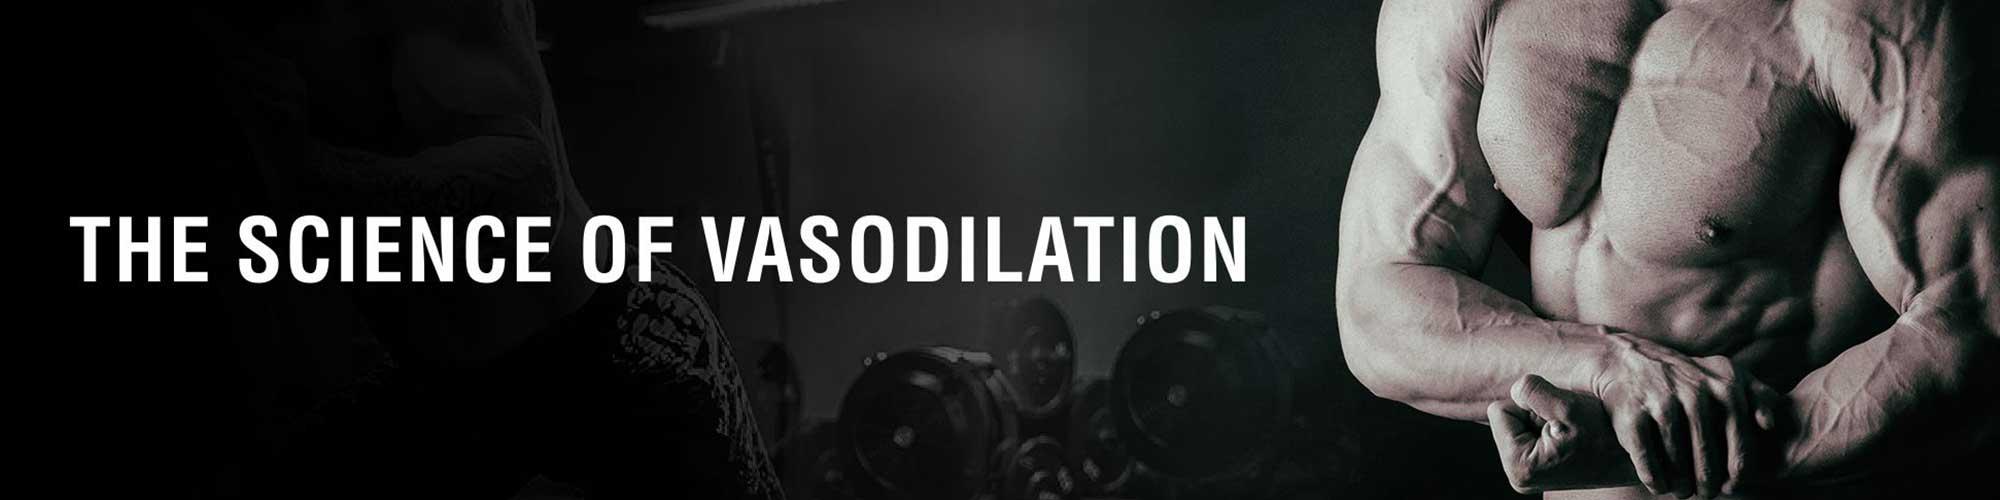 the-science-of-vasodilation